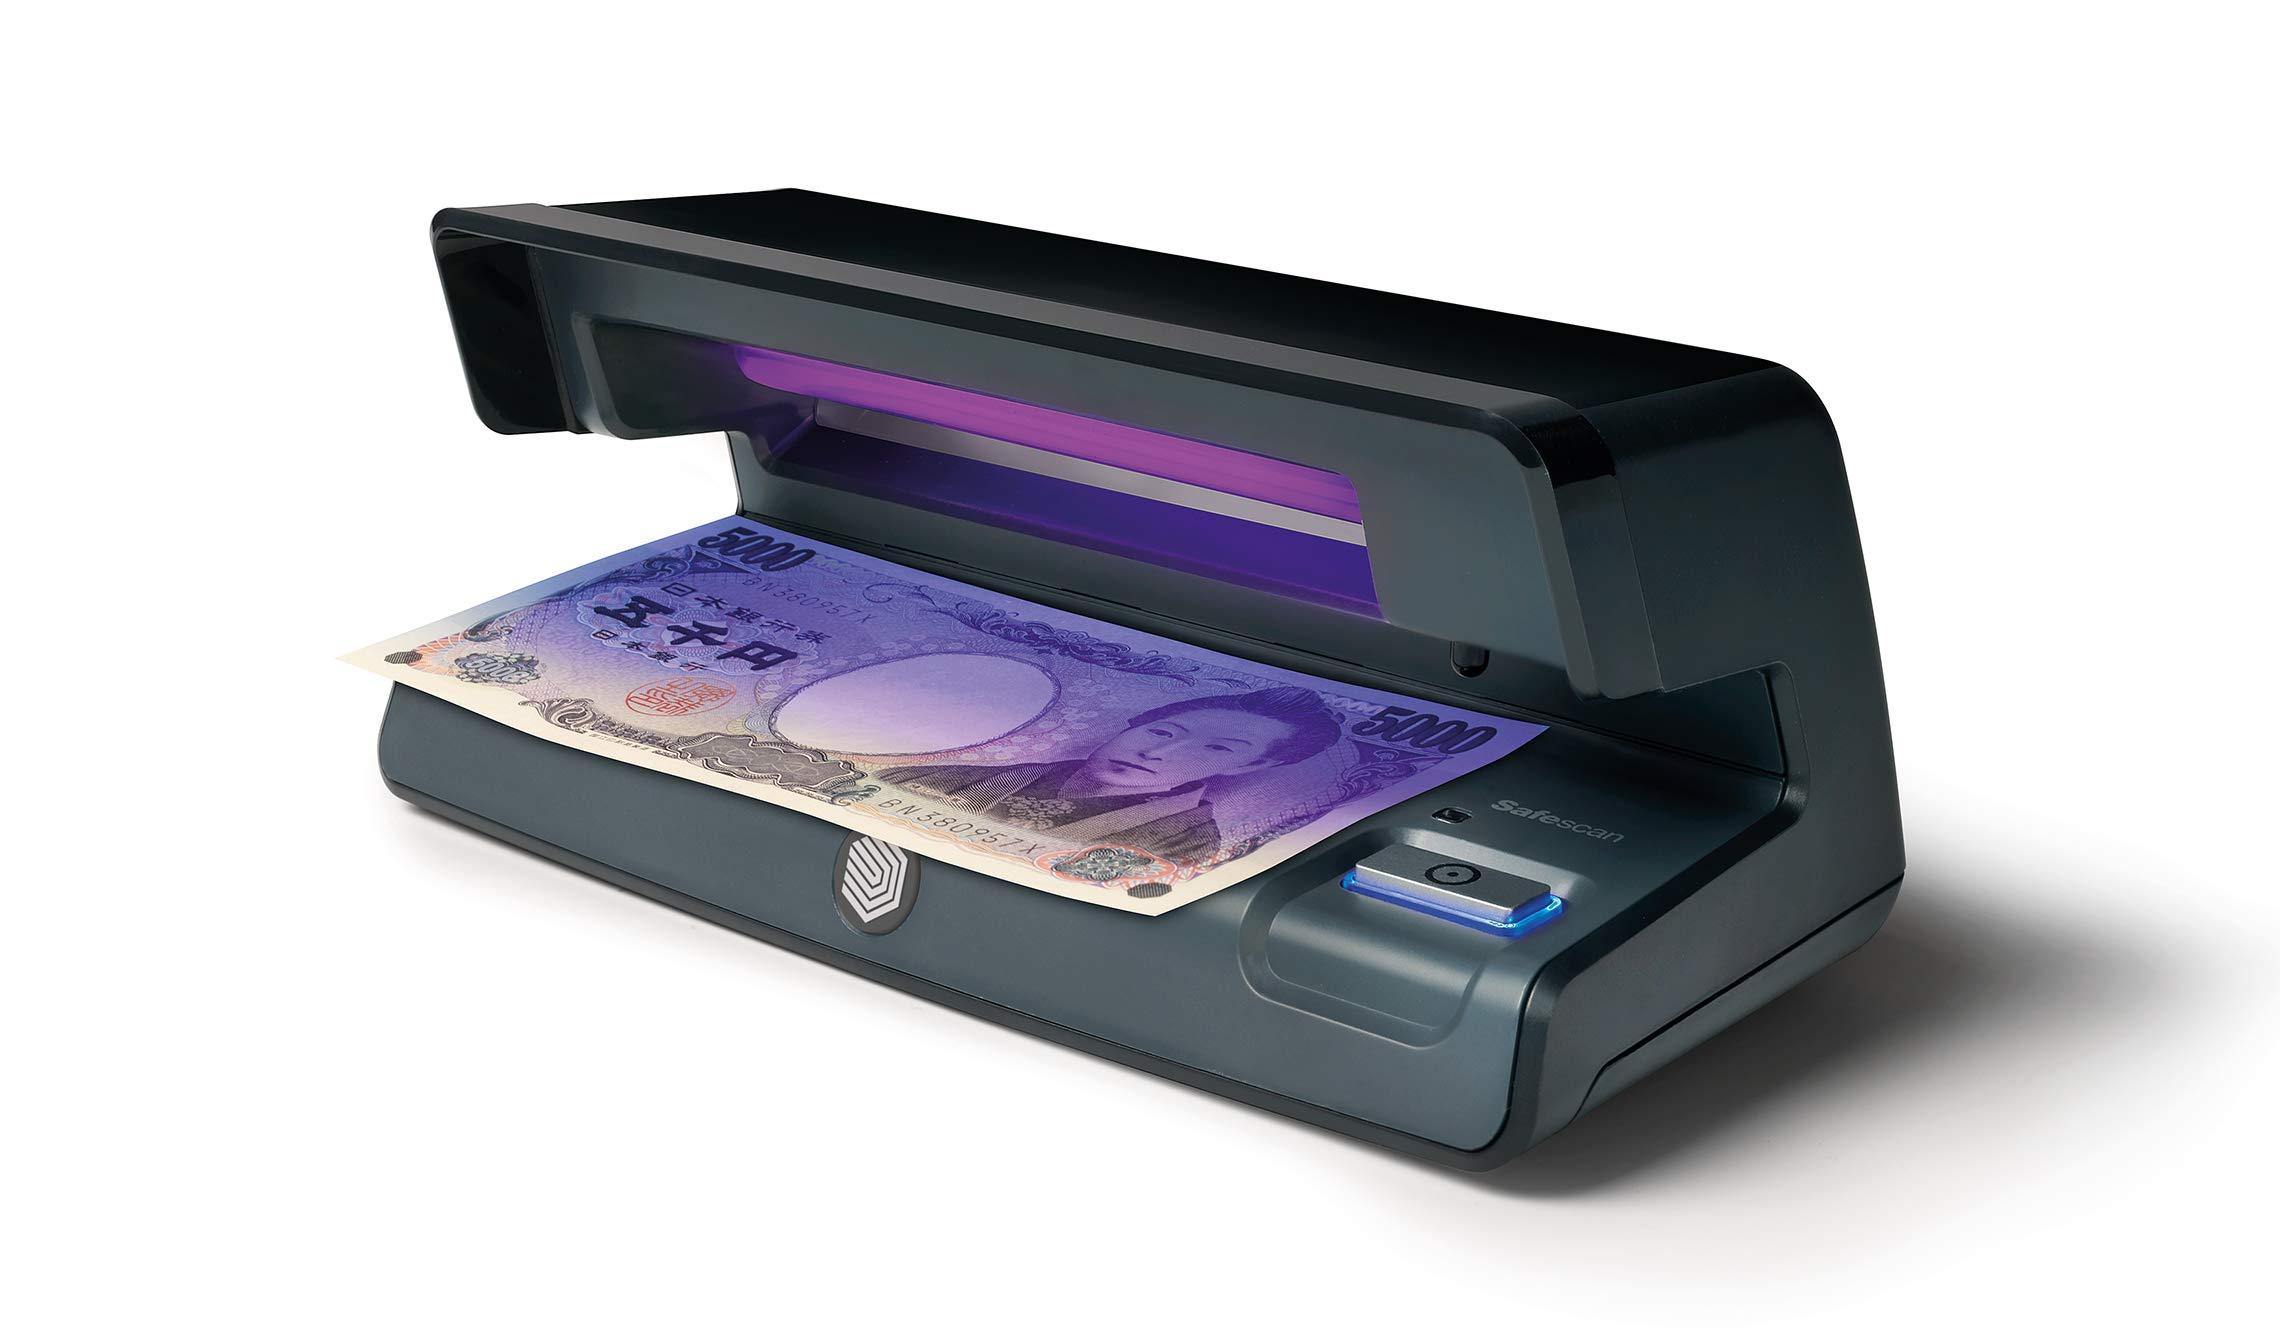 Safescan 70 UV Counterfeit Bill Detector